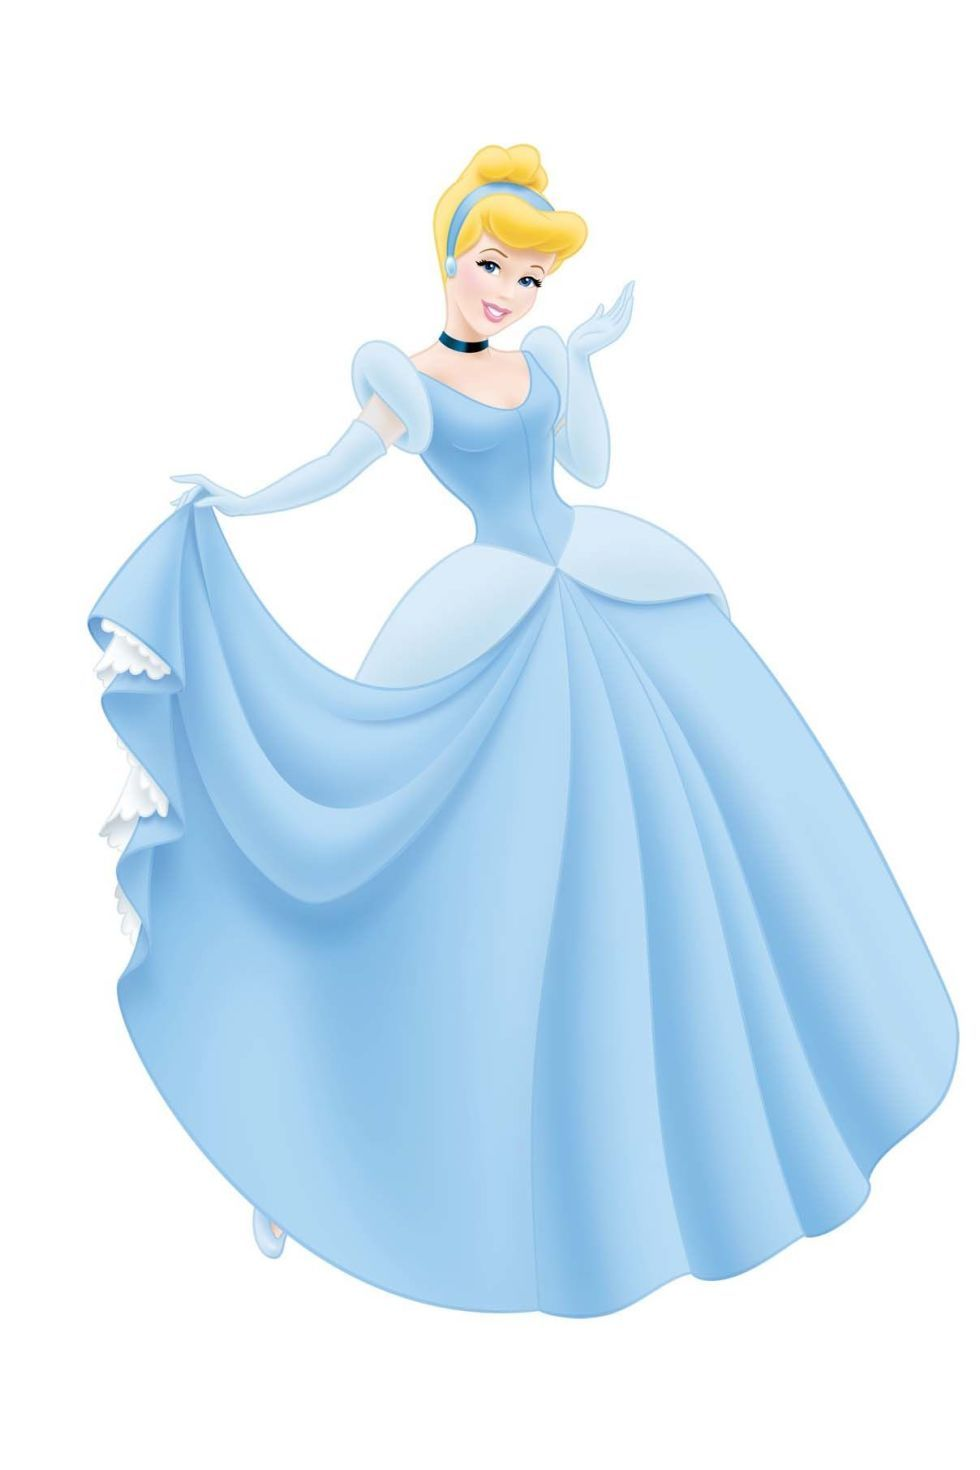 50 Times Celebrities Dressed Exactly Like Disney Princesses